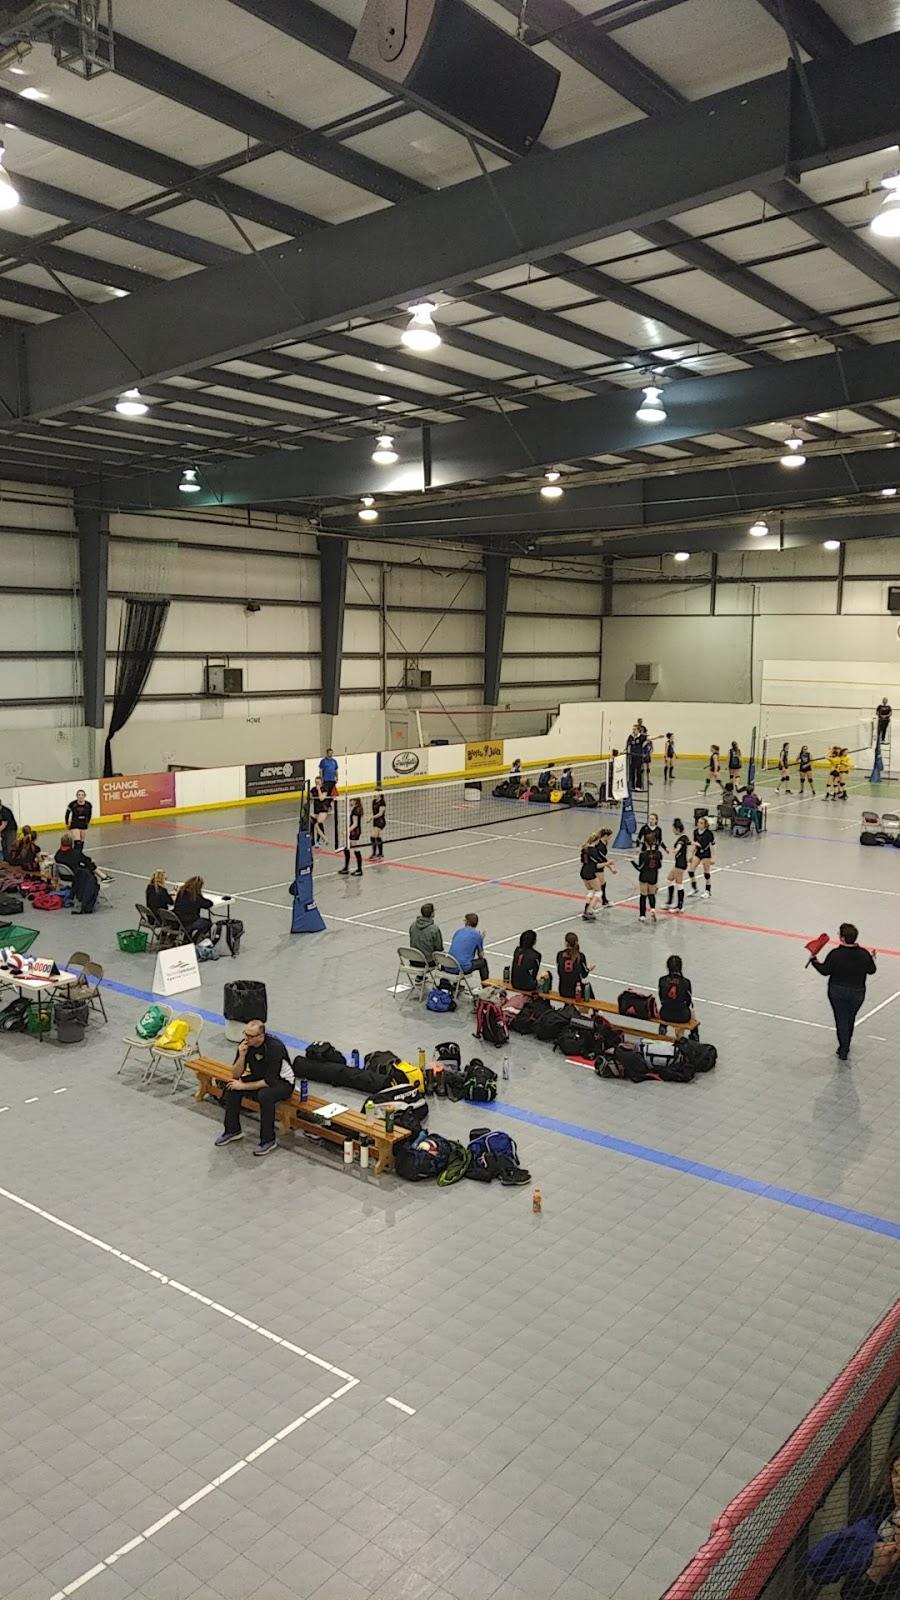 Henk Ruys Soccer Centre | gym | 219 Primrose Dr, Saskatoon, SK S7K 2J9, Canada | 3069753400 OR +1 306-975-3400